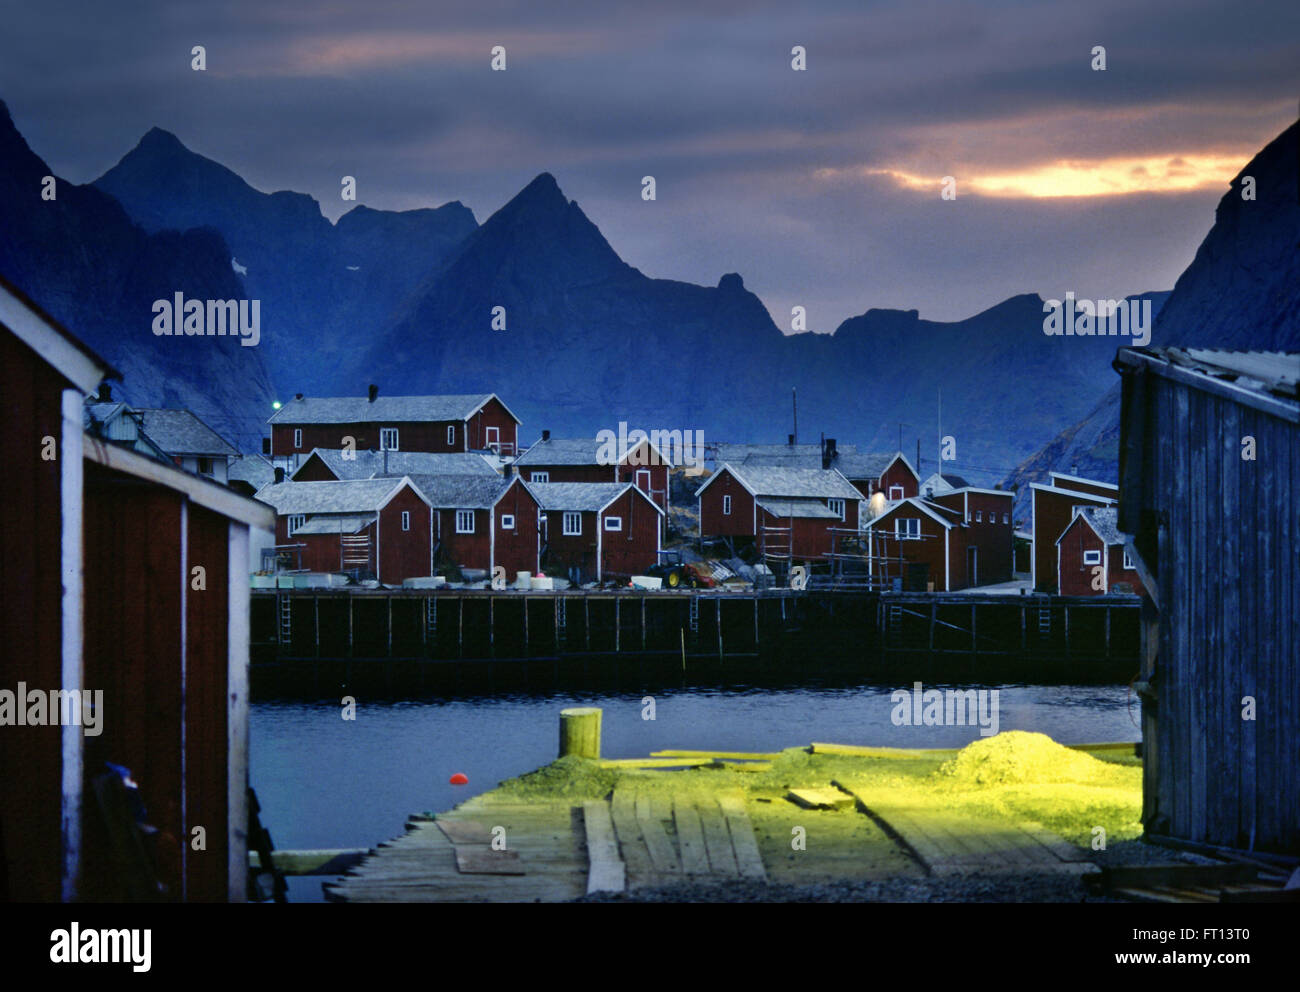 Rorbu fisherman hut in Reine, Reine, Lofoten Islands, Norway, Scandinavia - Stock Image